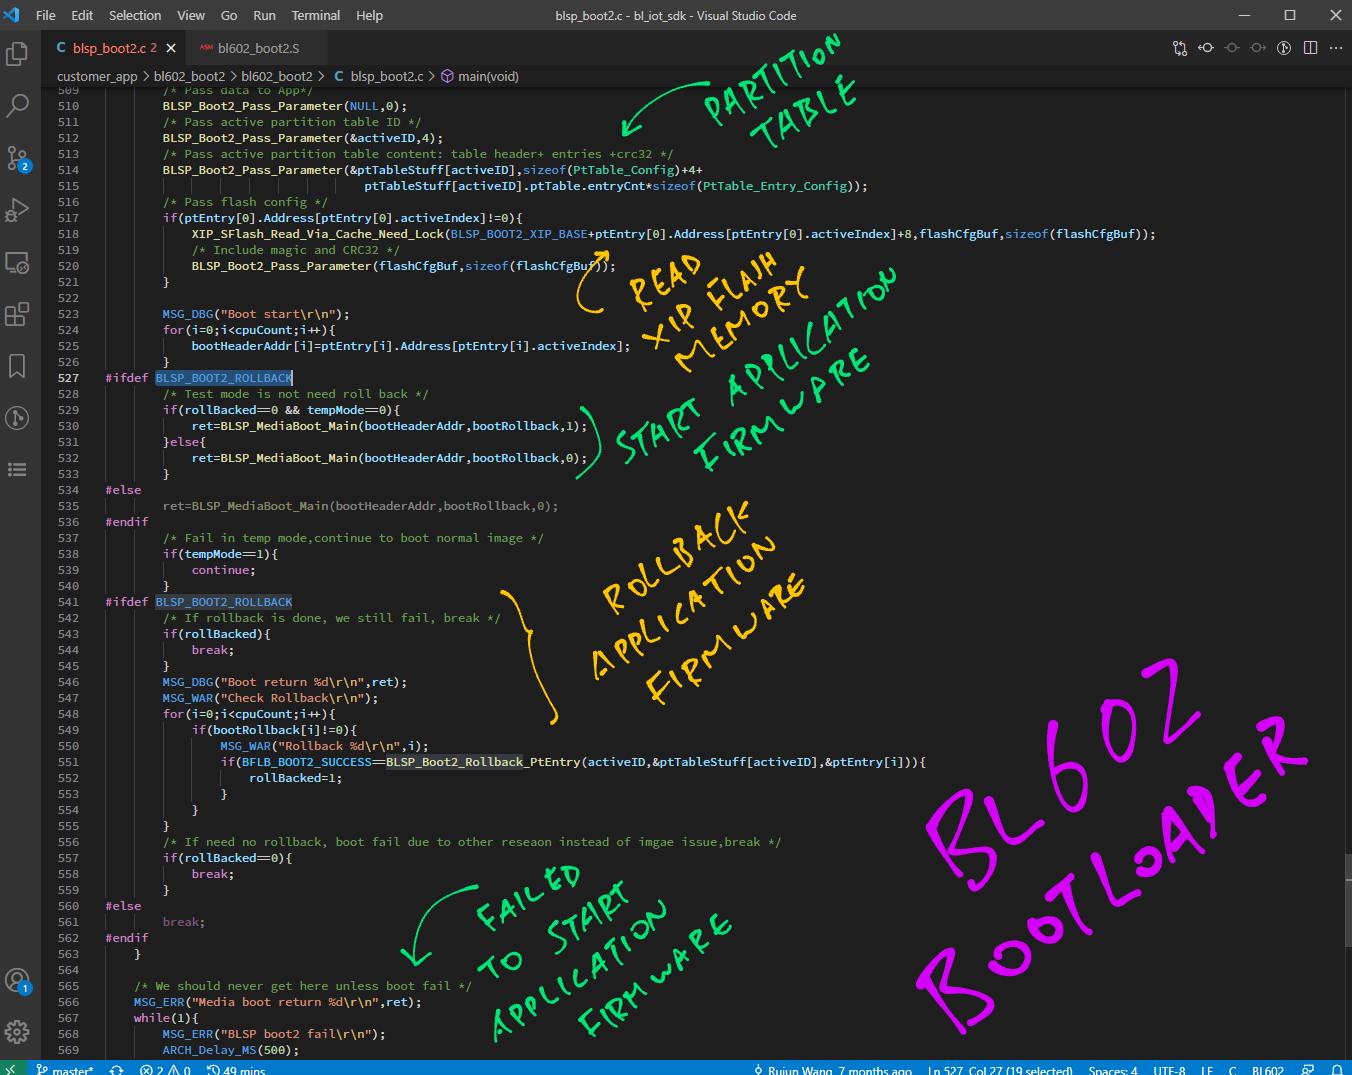 Bootloader Main Function